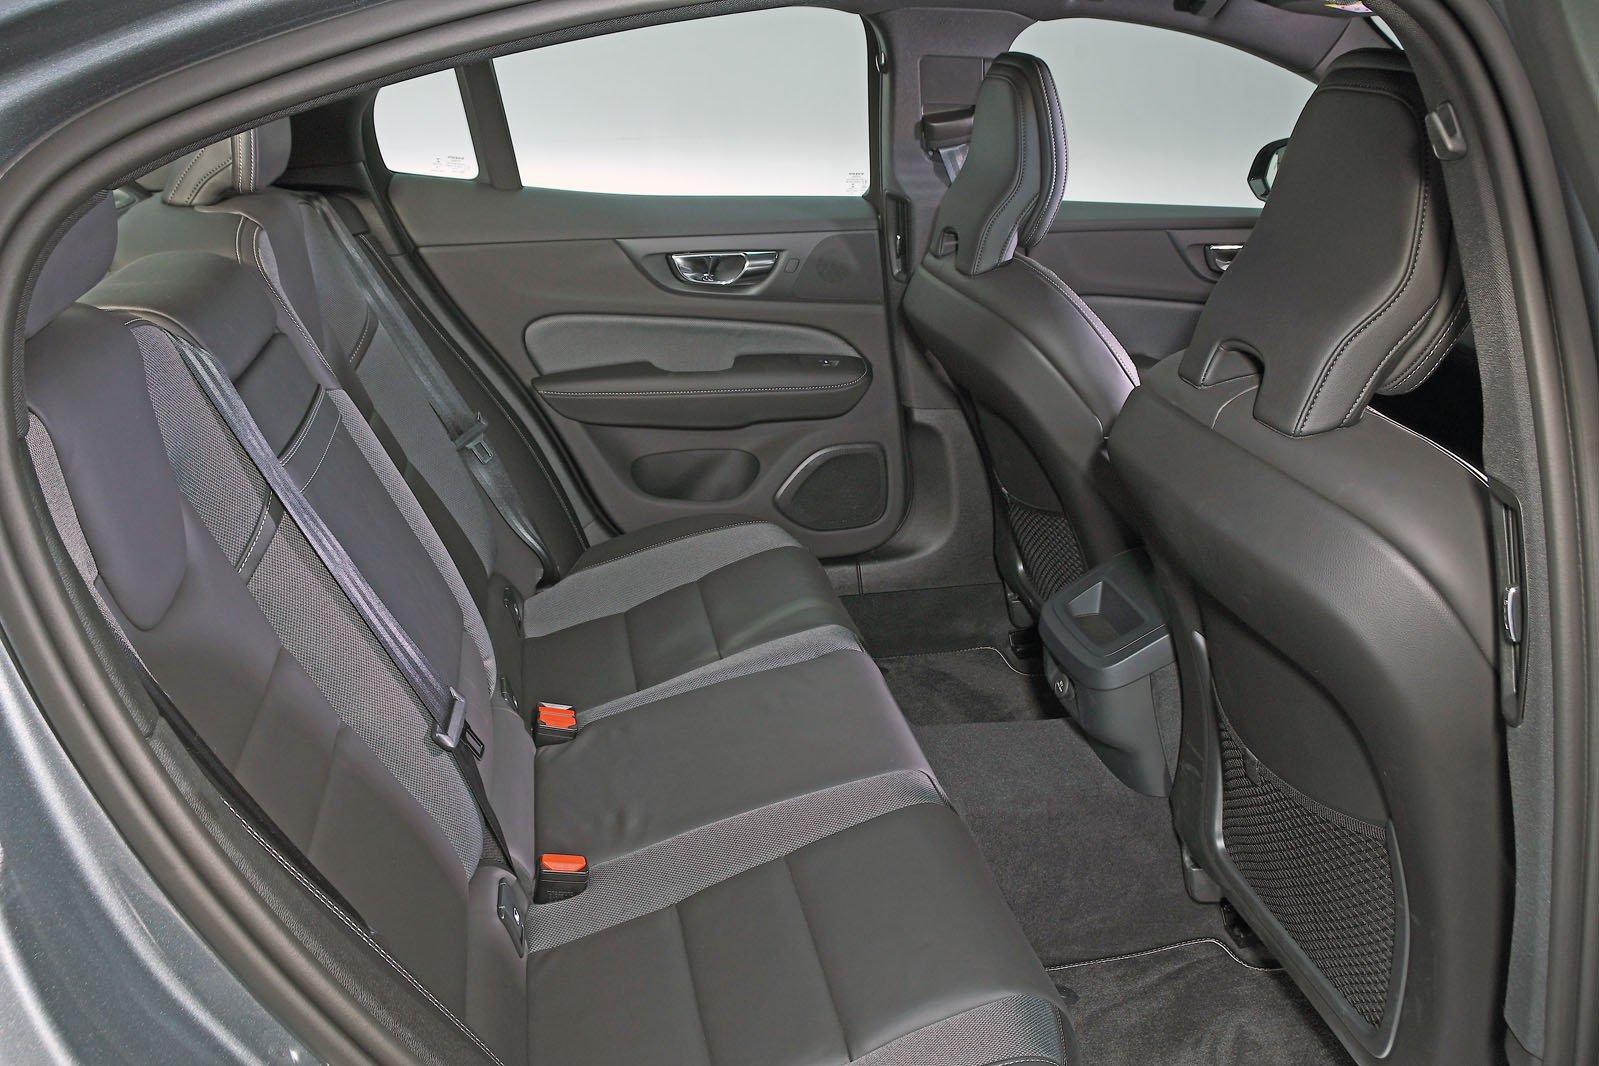 Volvo S60 rear seats